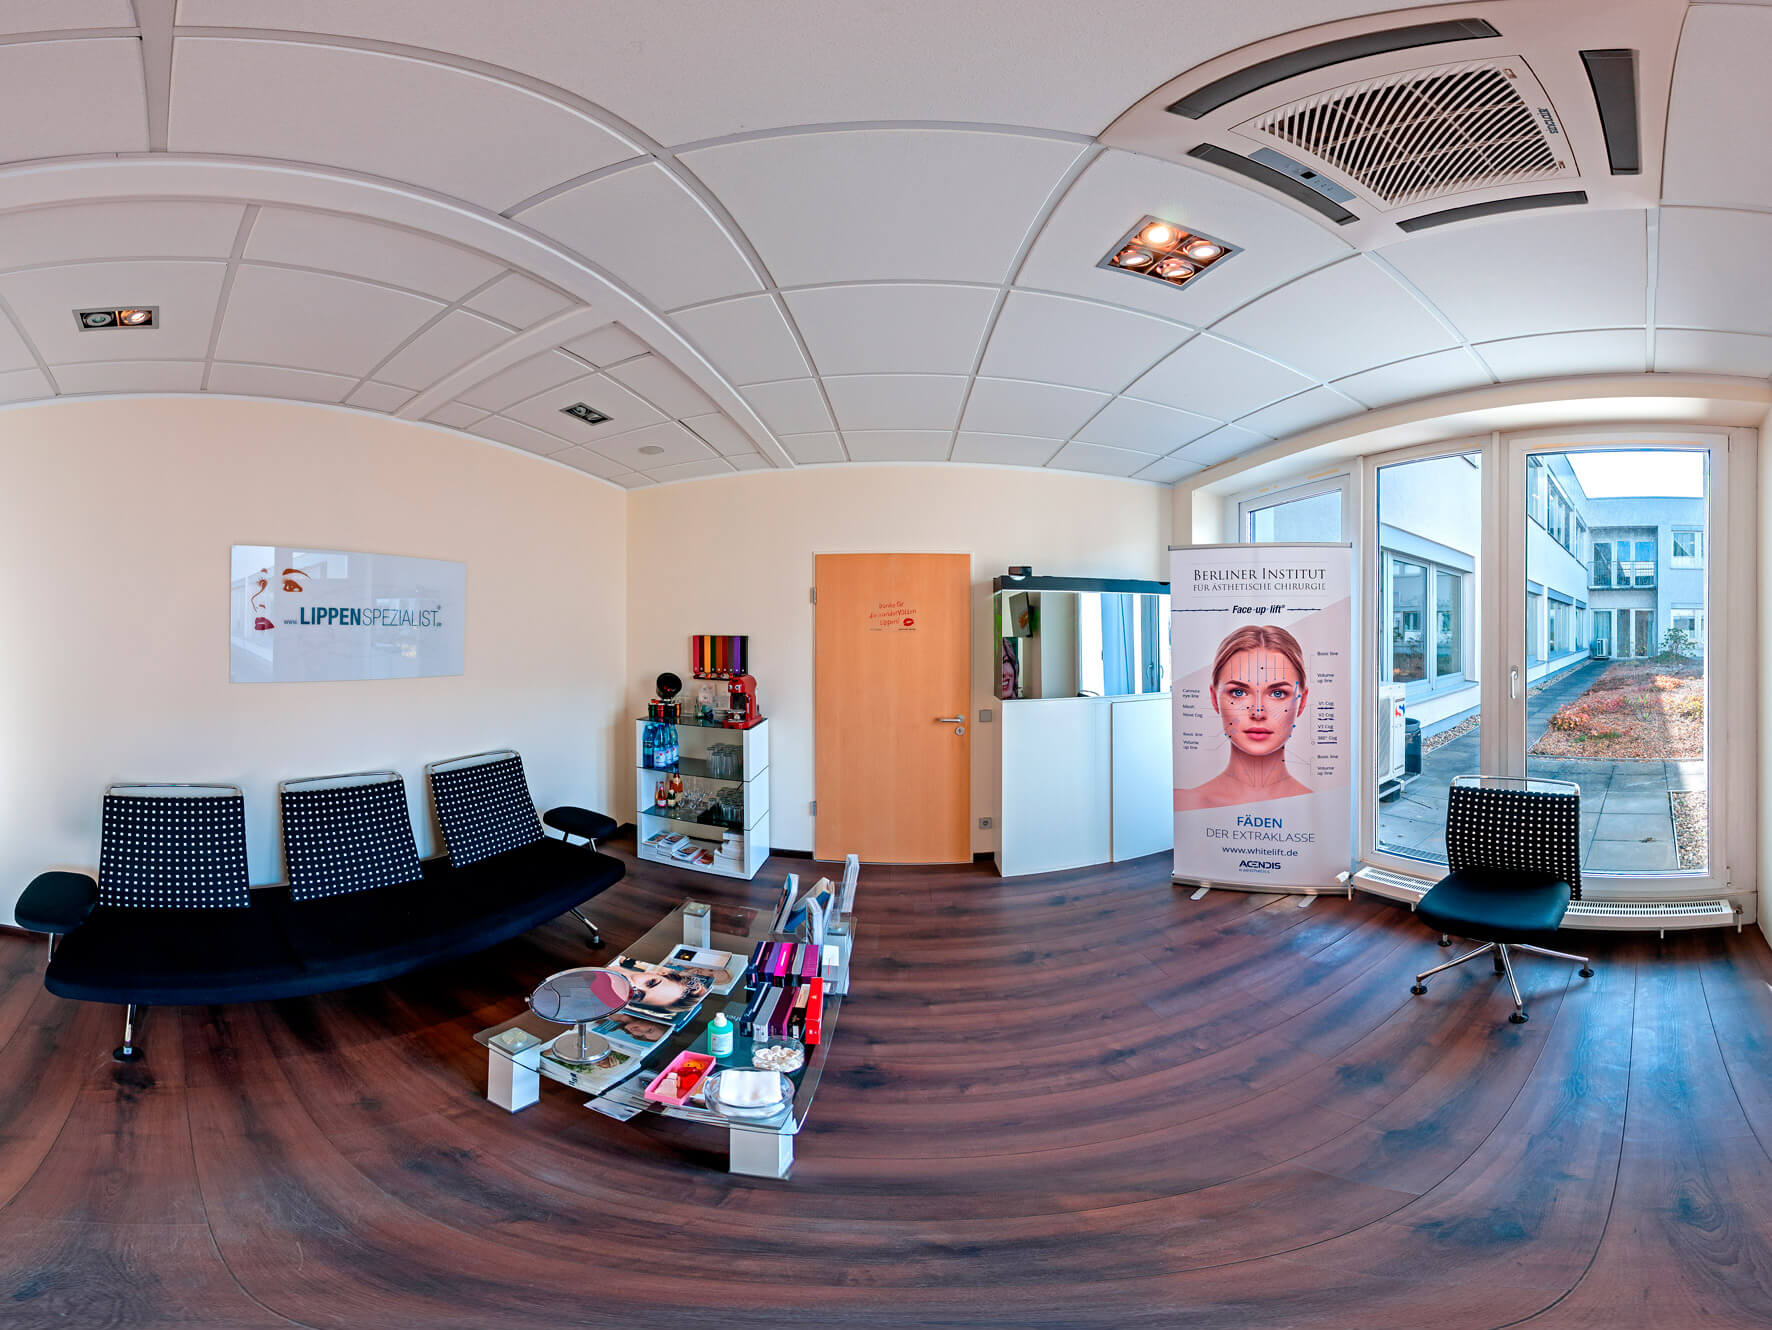 Institut für Ästhetische Chirurgie Berlin Adlershof